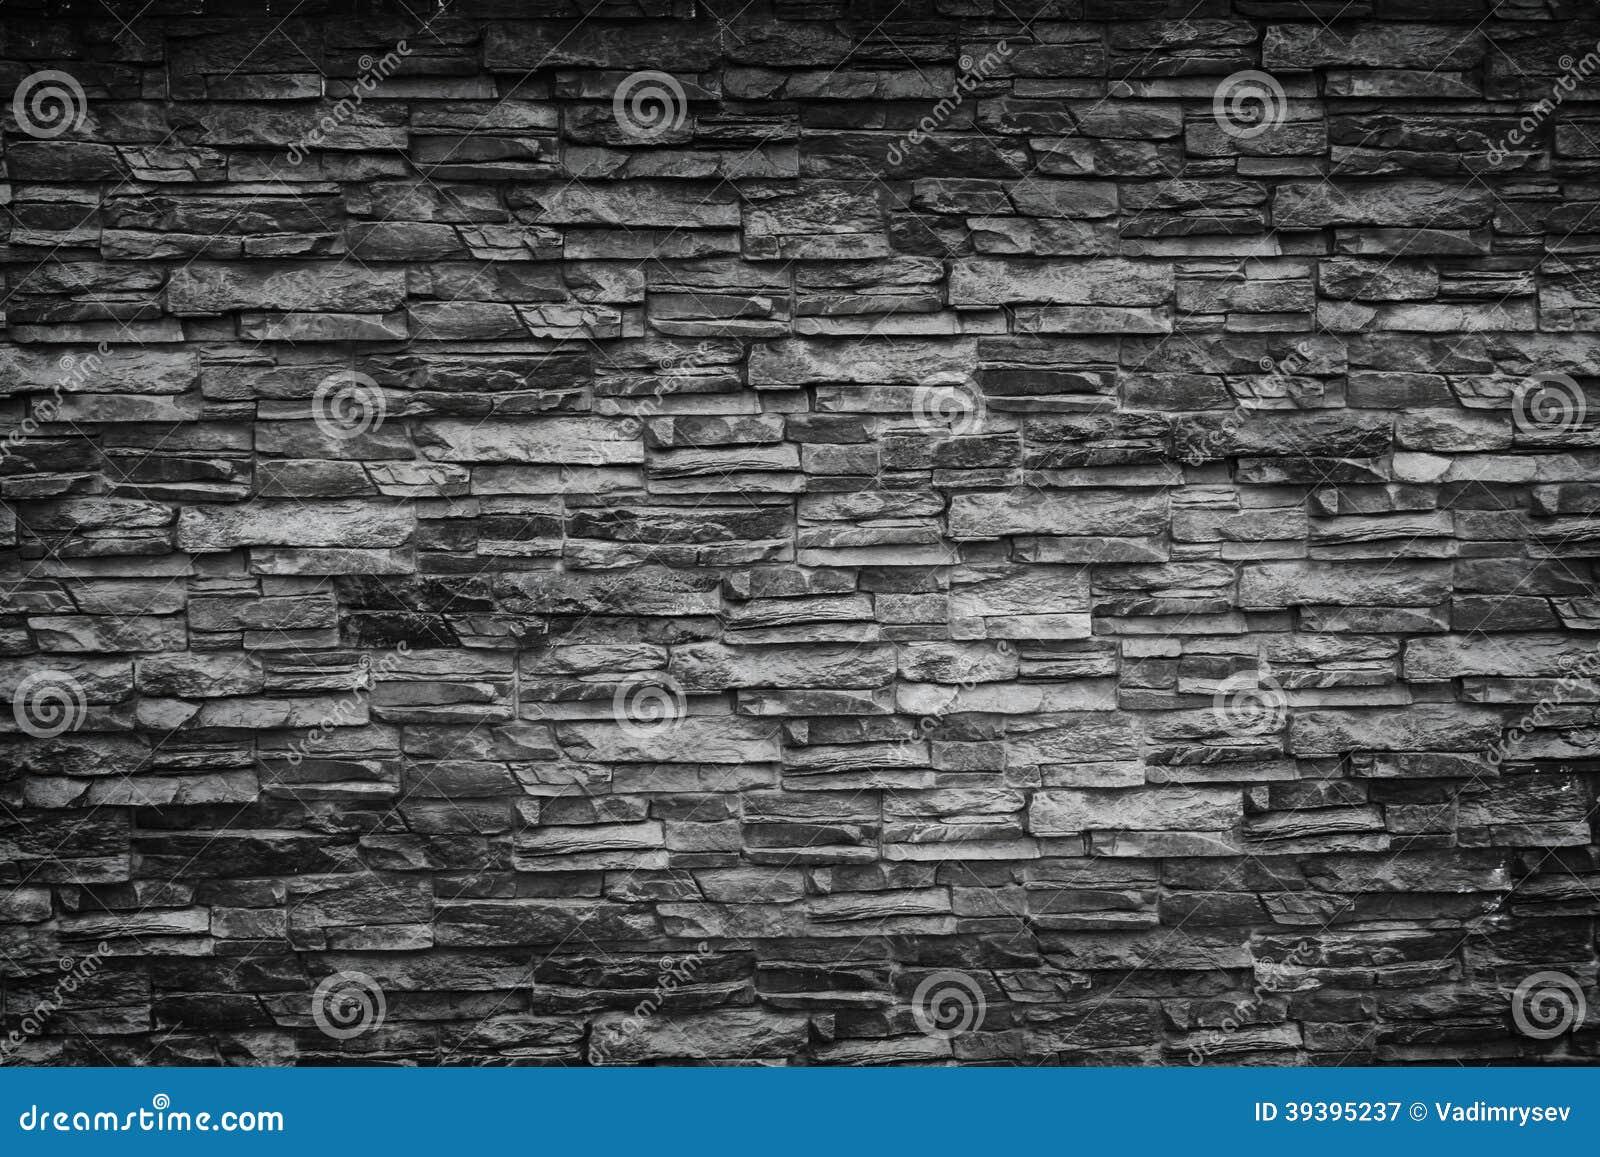 Black Stone Wall Stock Photo - Image: 39395237